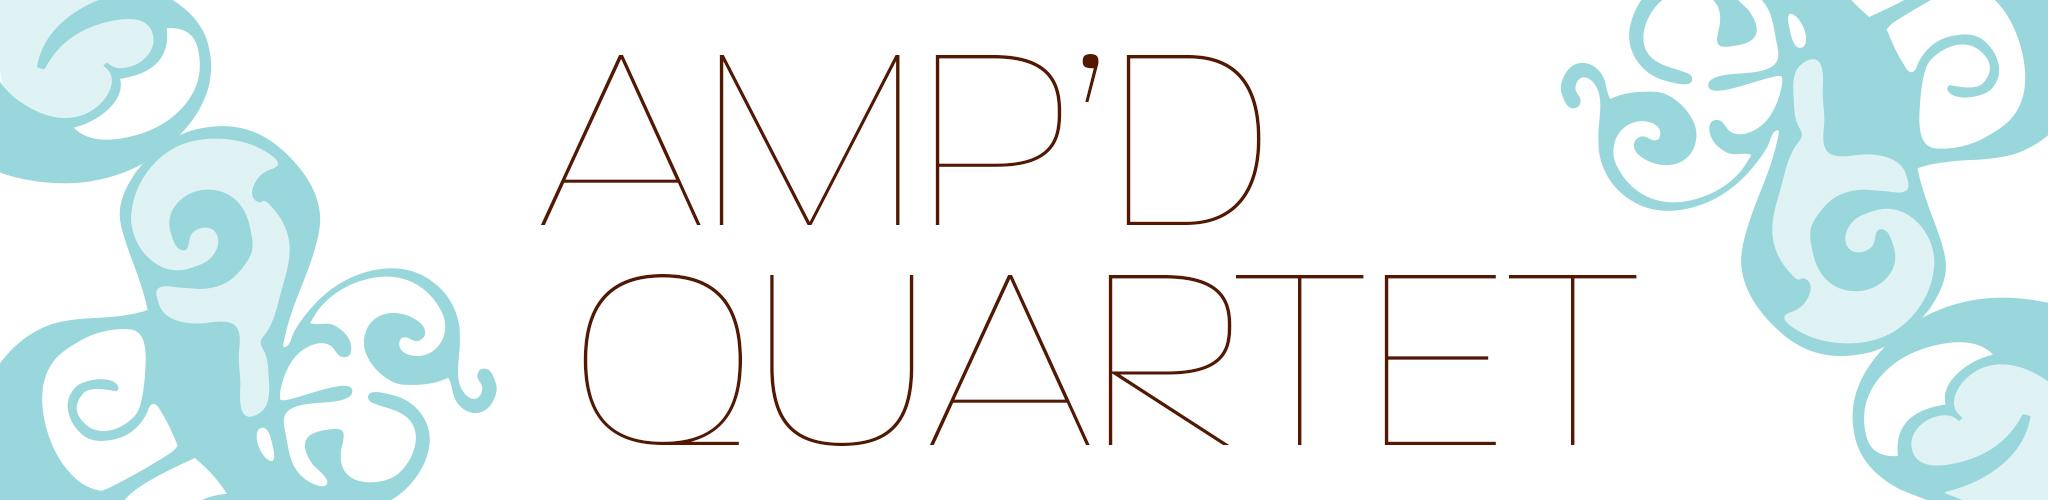 Amp'd String Quartet | Divisi Strings